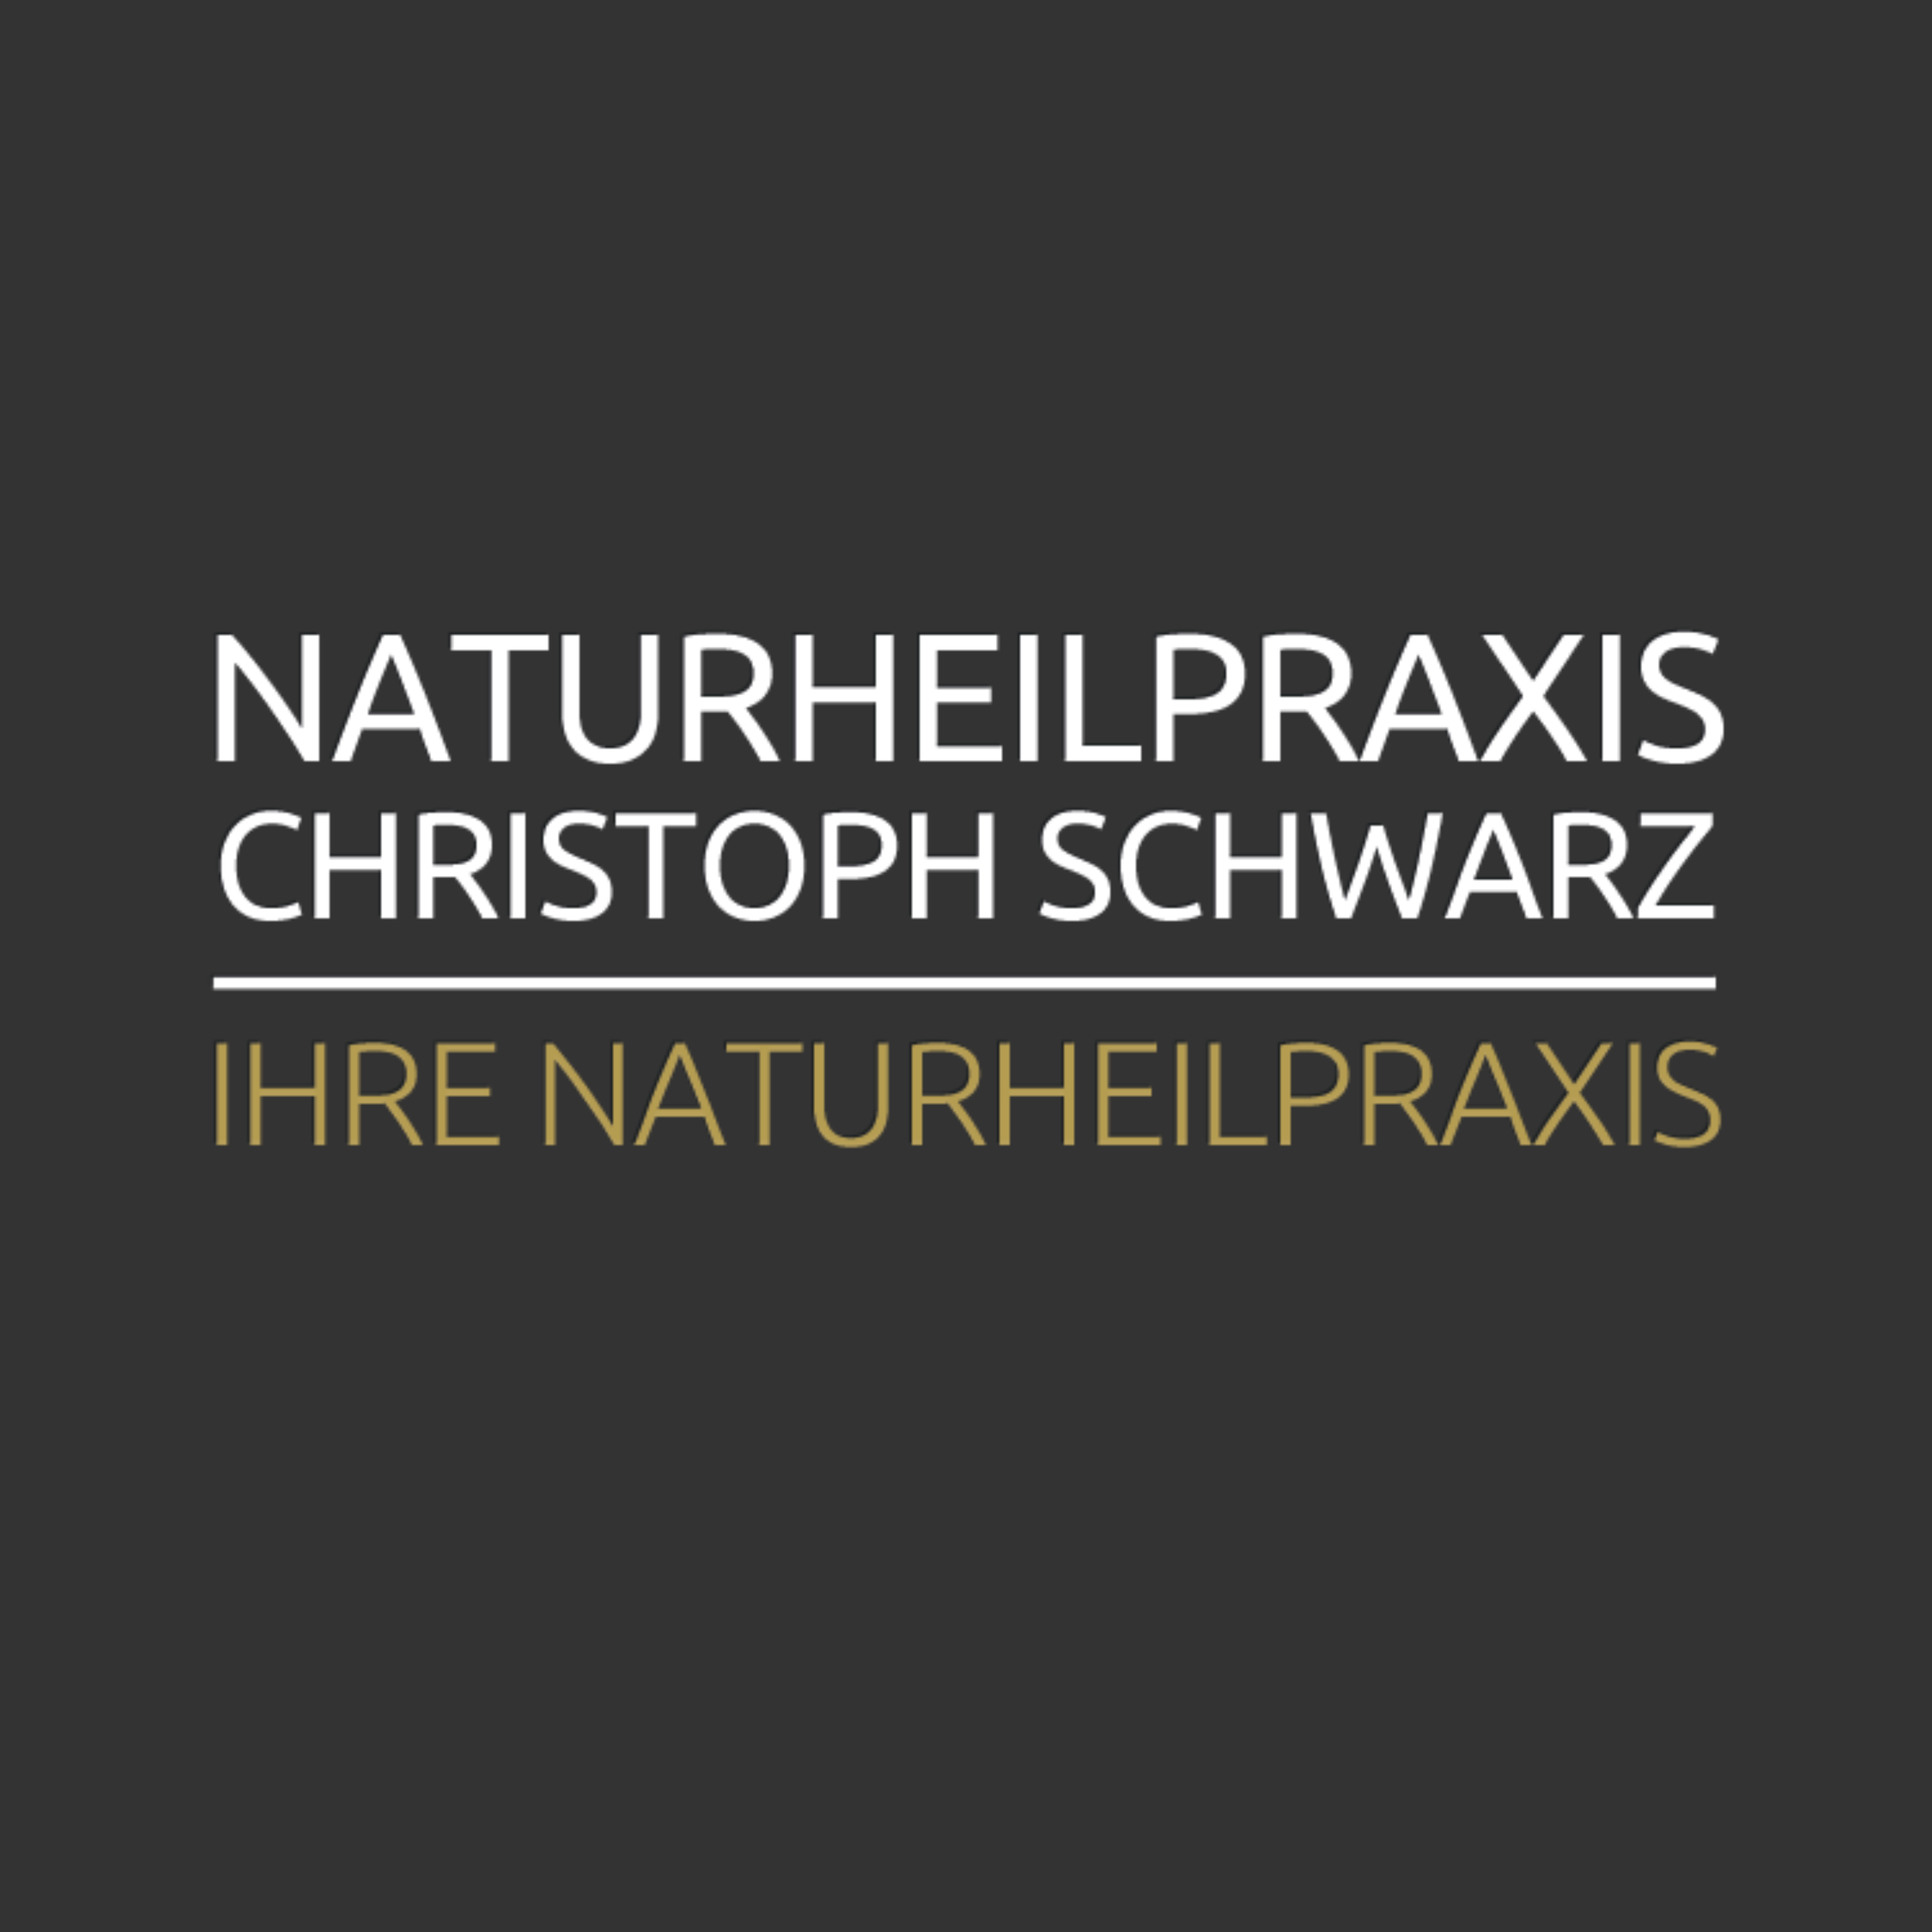 Naturheilpraxis Christoph Schwarz